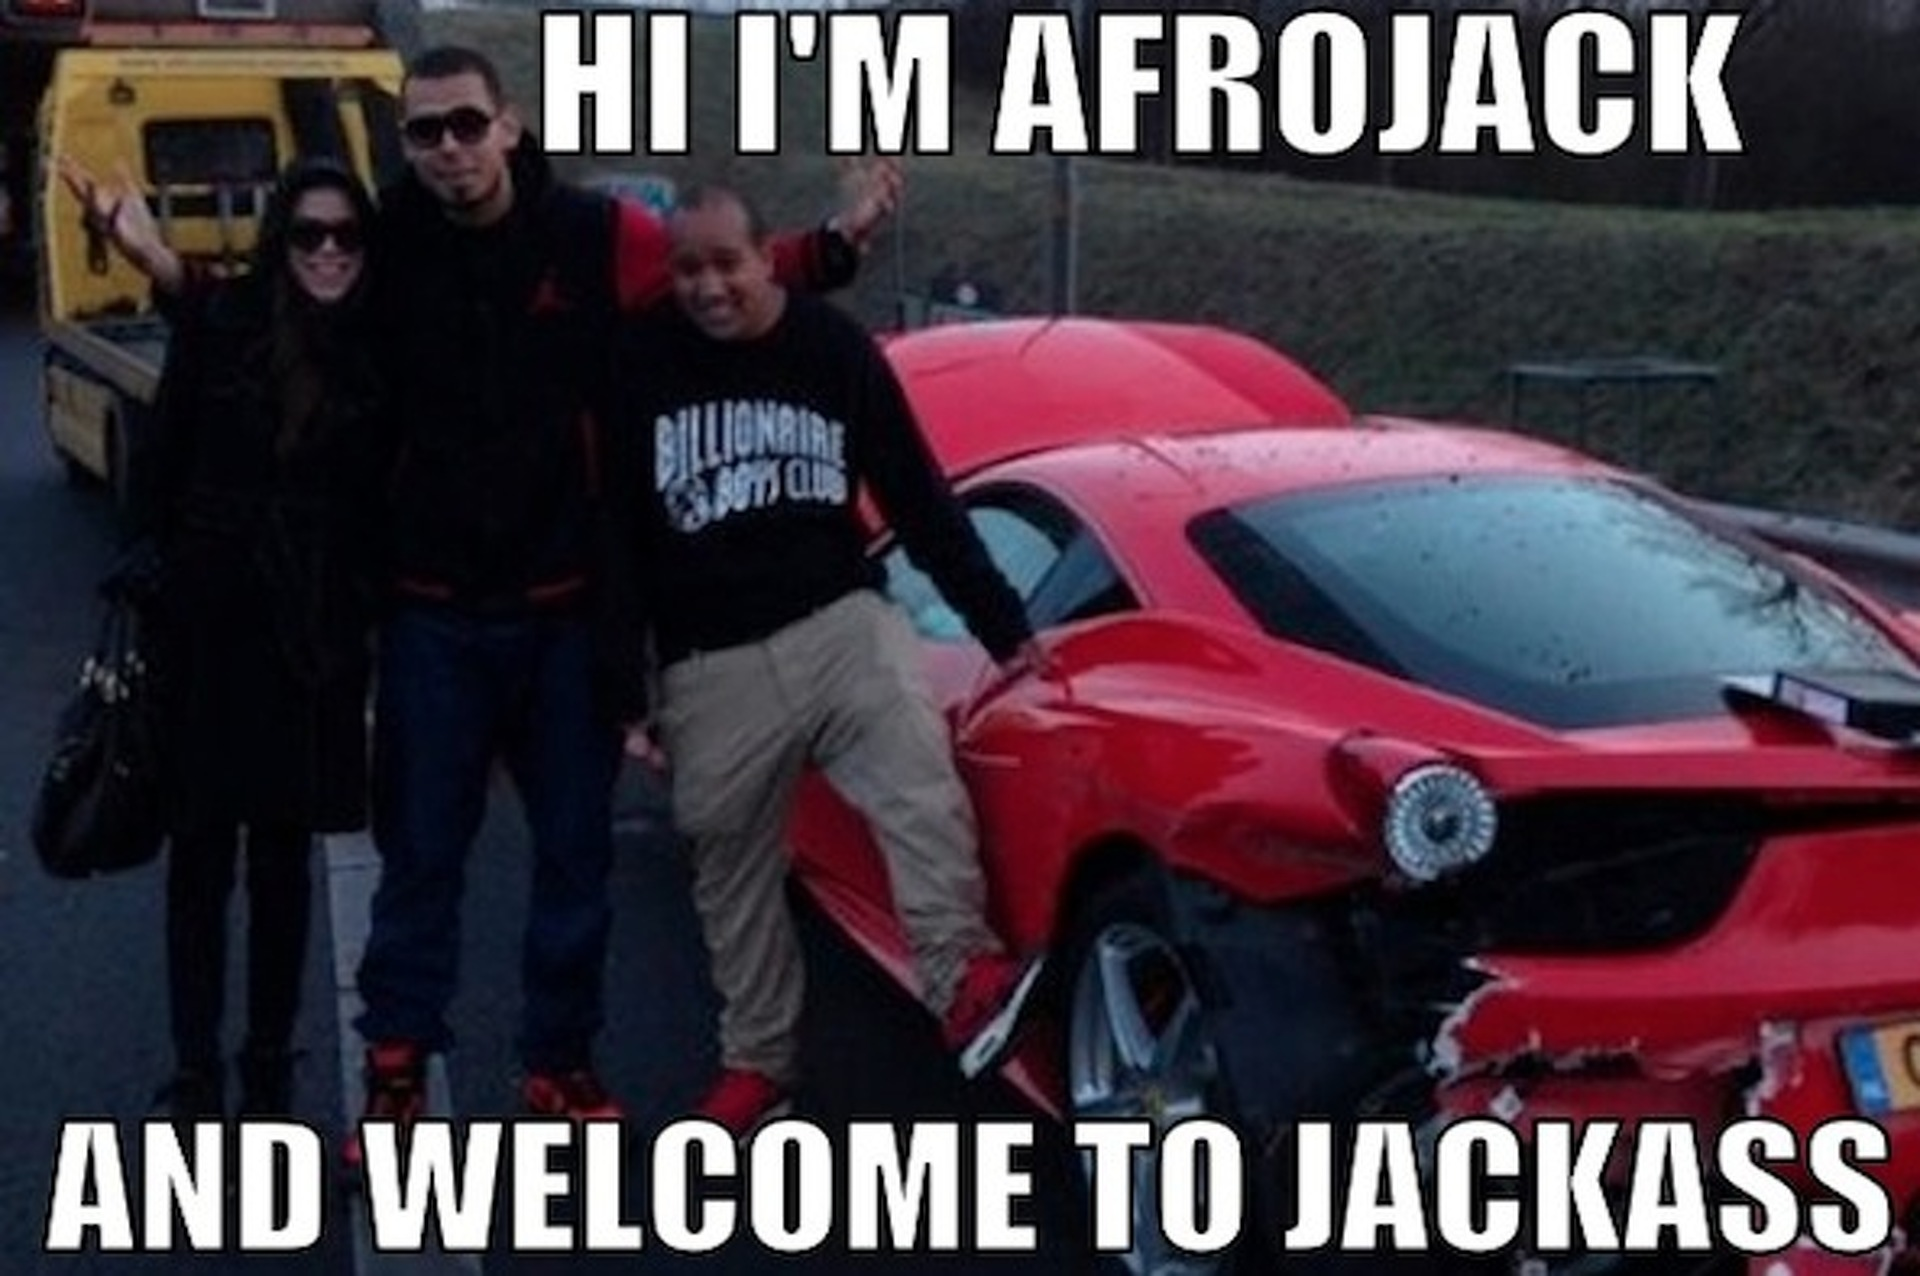 DJ Afrojack Wrecks His Ferrari 458 and Doesn't Give a Damn